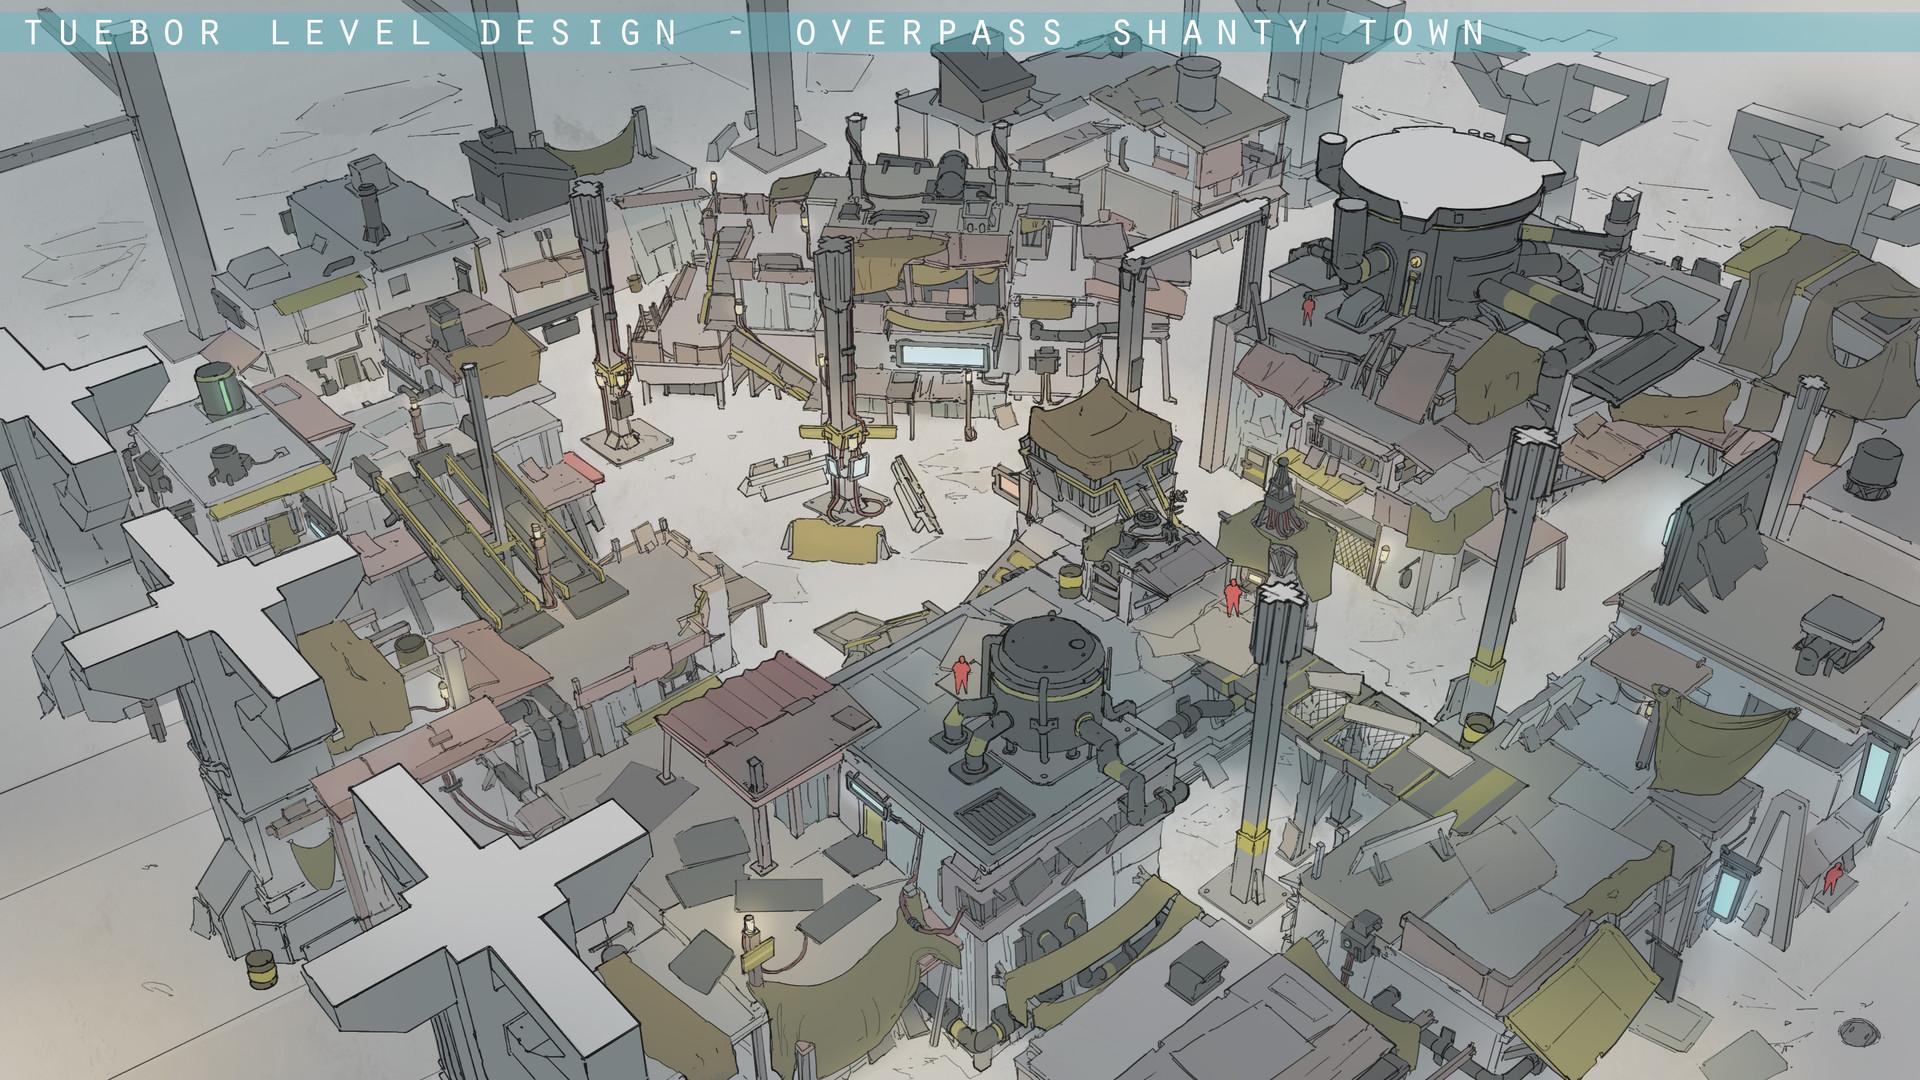 Franklin chan overpass level design 03